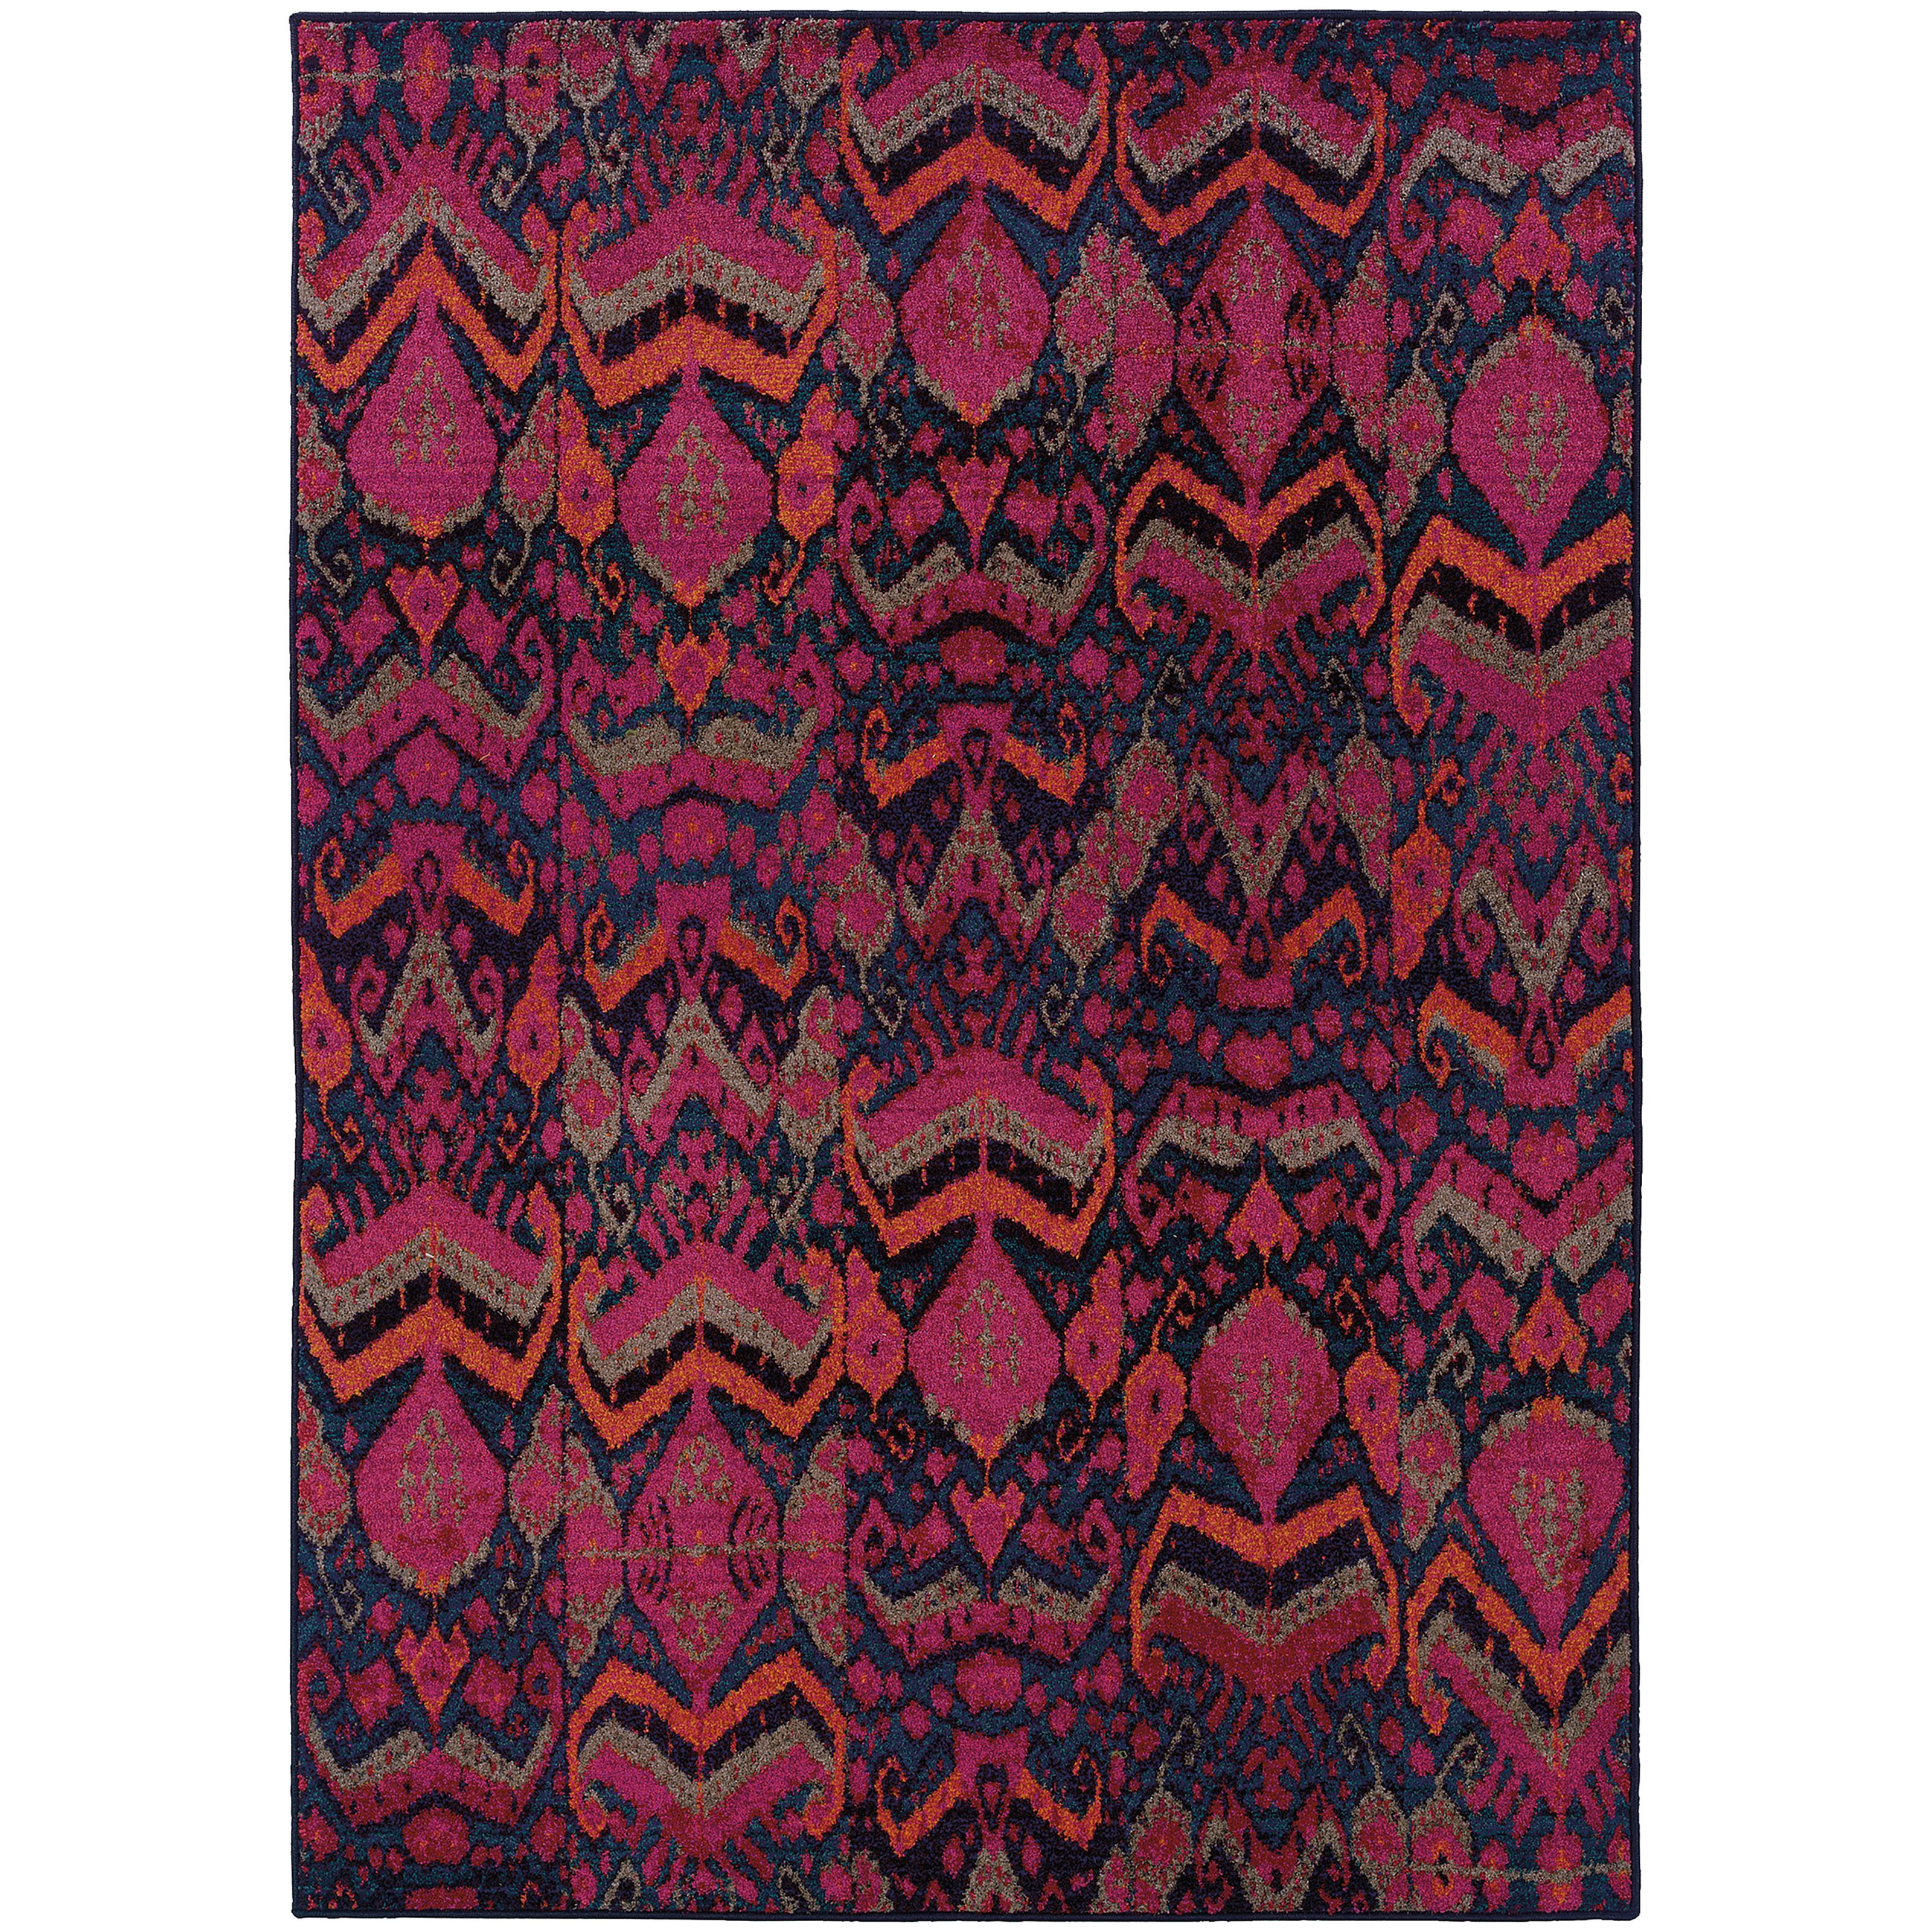 "Oriental Weavers Kaleidoscope 9' 9"" X 12' 2"" Rug - Item Number: K004X5300380ST"